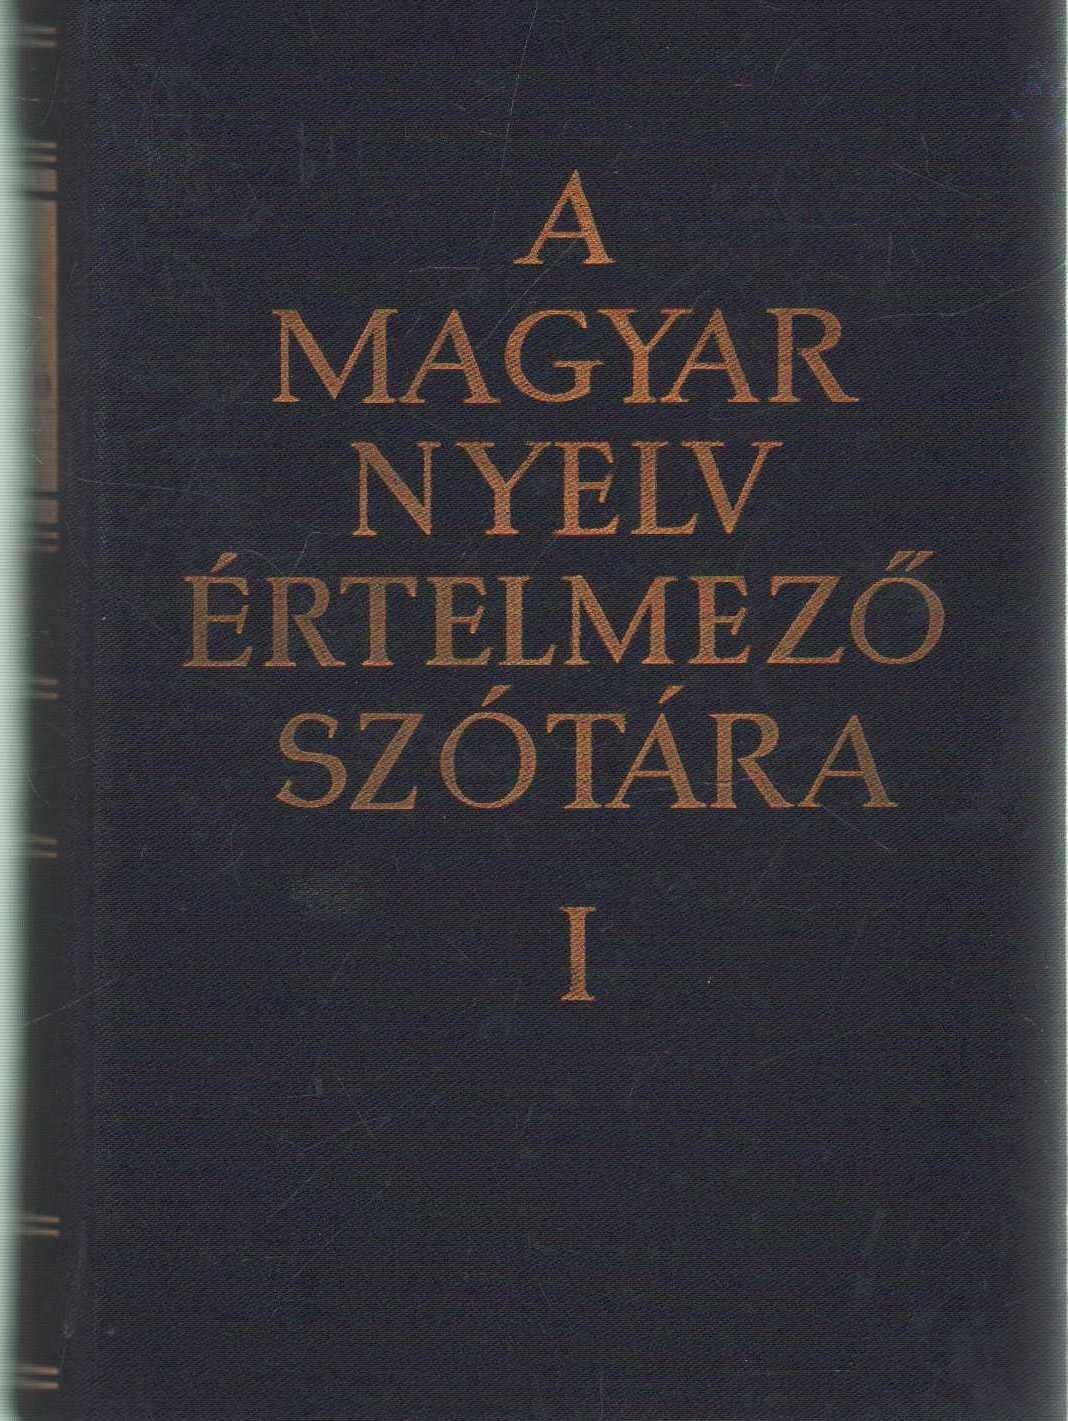 https://konyvlabirintus.hu/54397/a-magyar-nyelv-ertelmezo-szotara-i-vii-kotet-1966.jpg